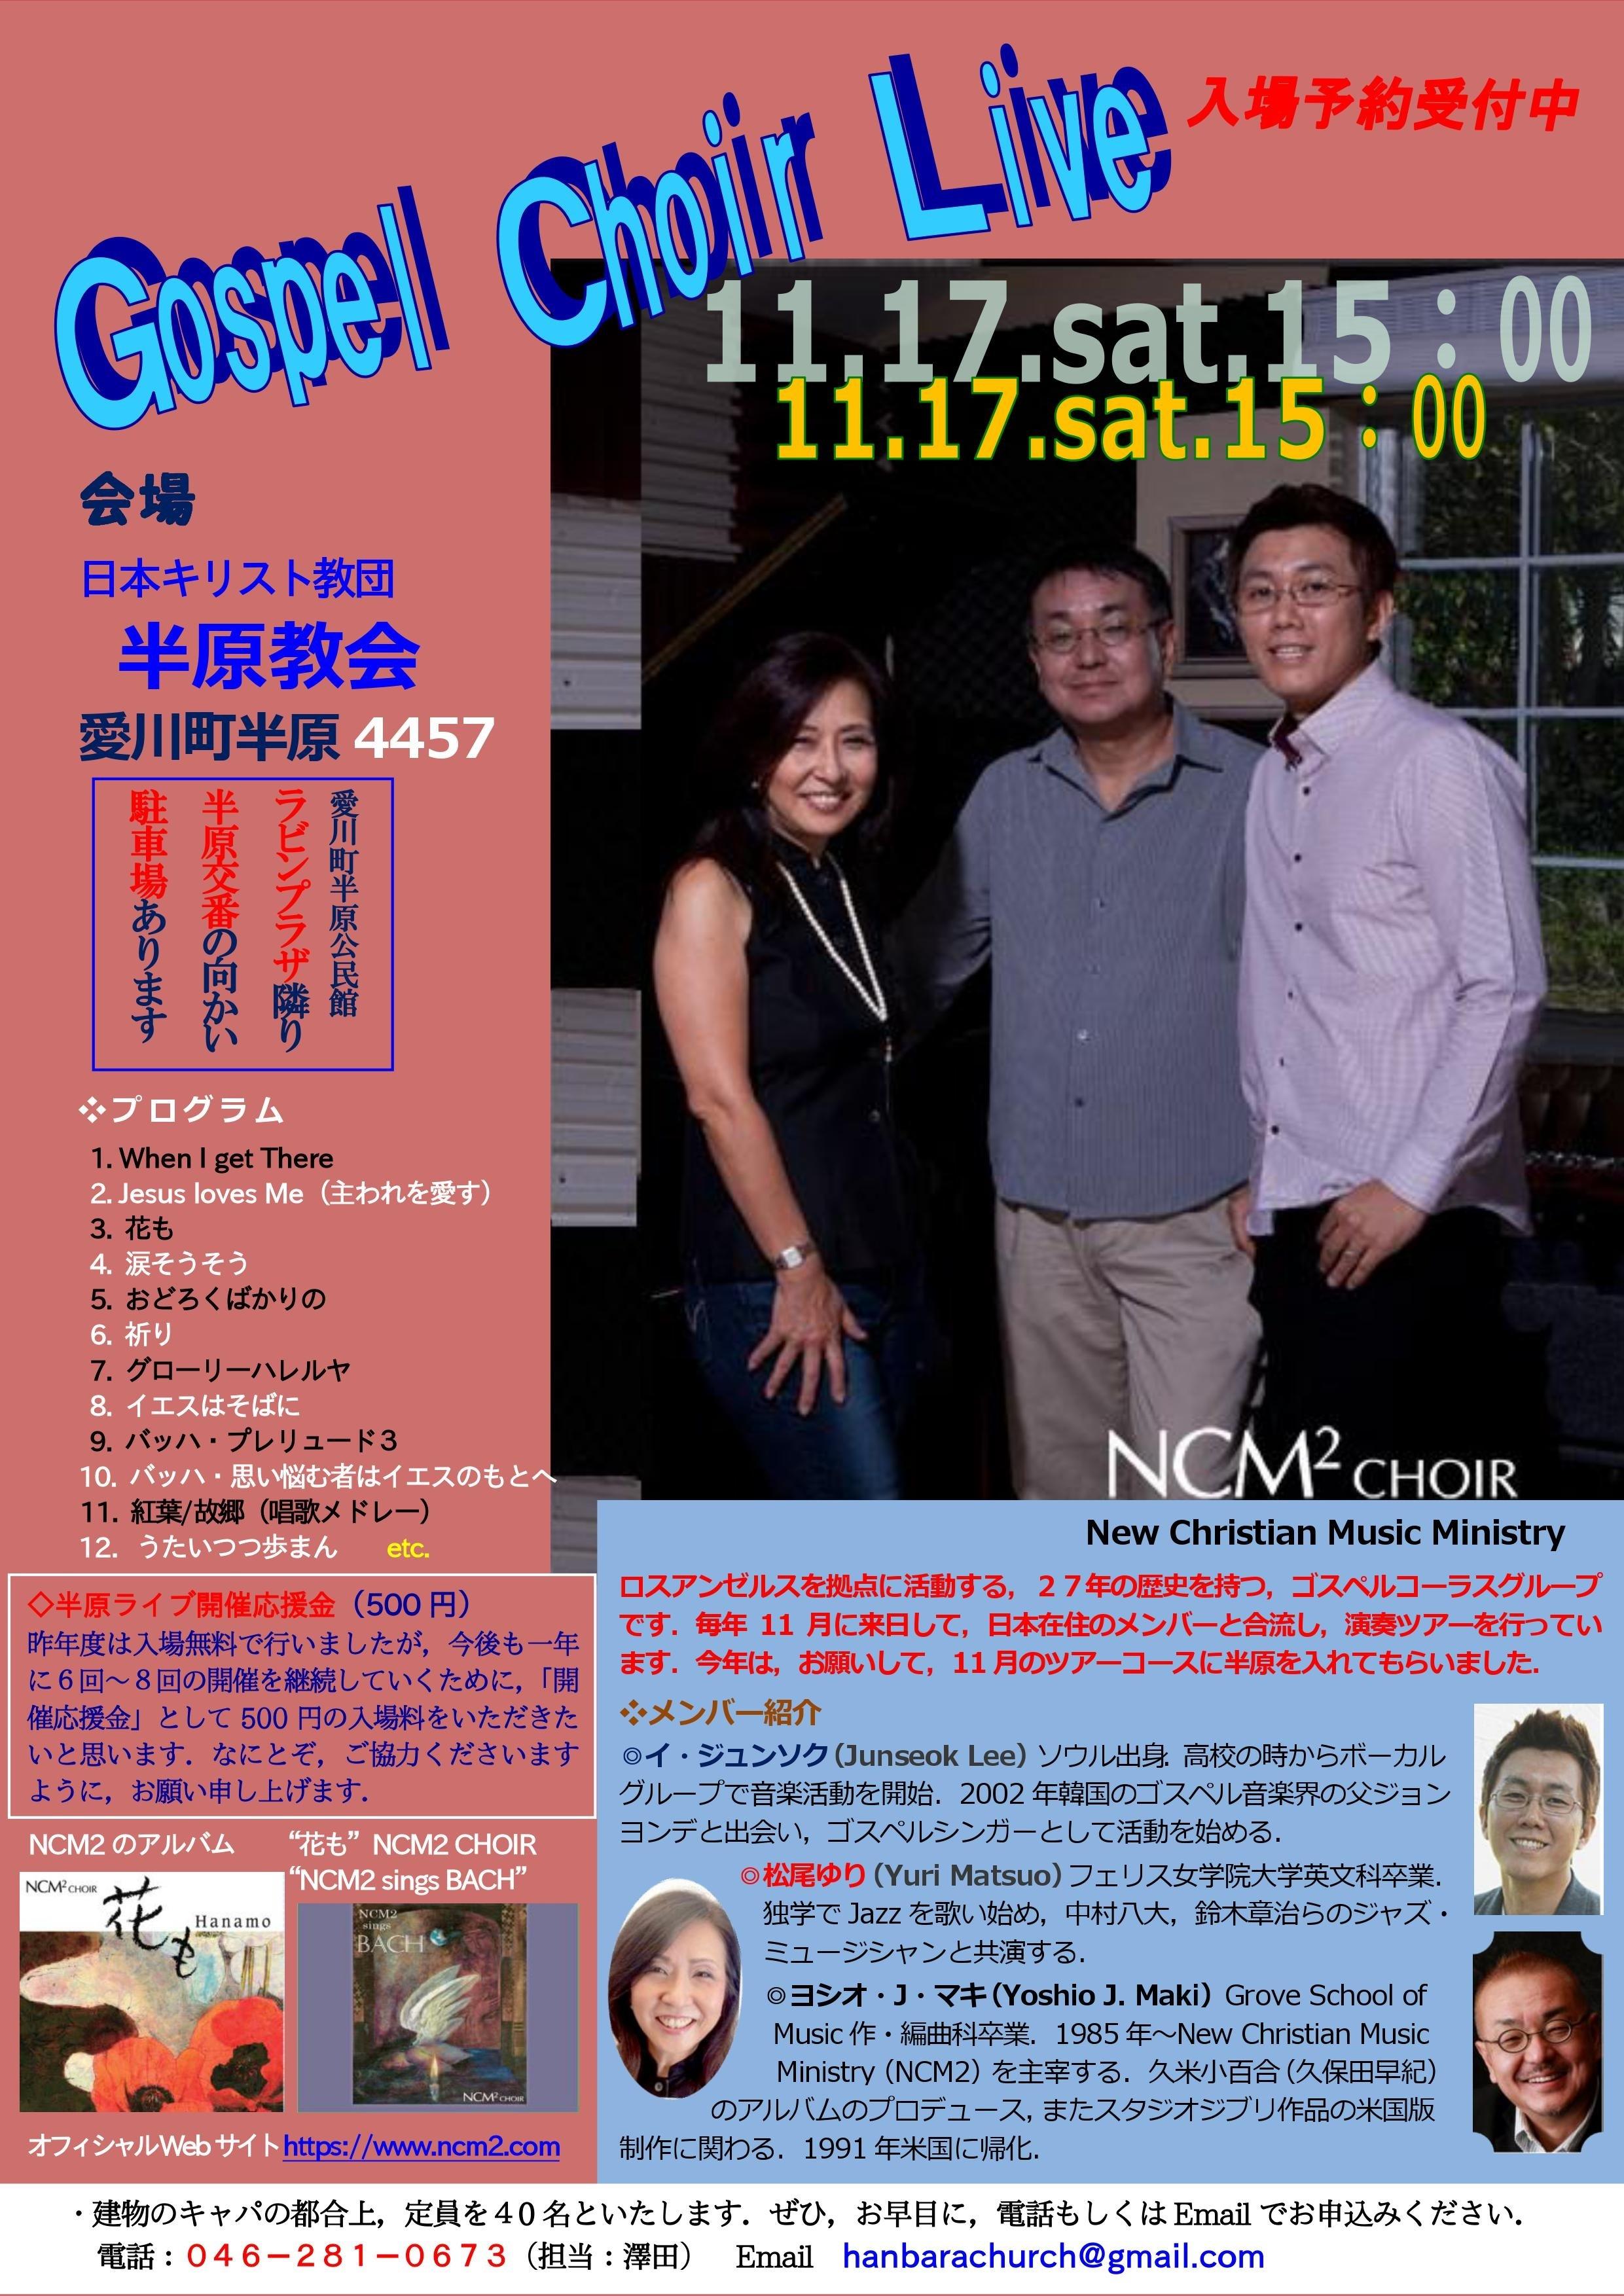 NCM2gospel Live